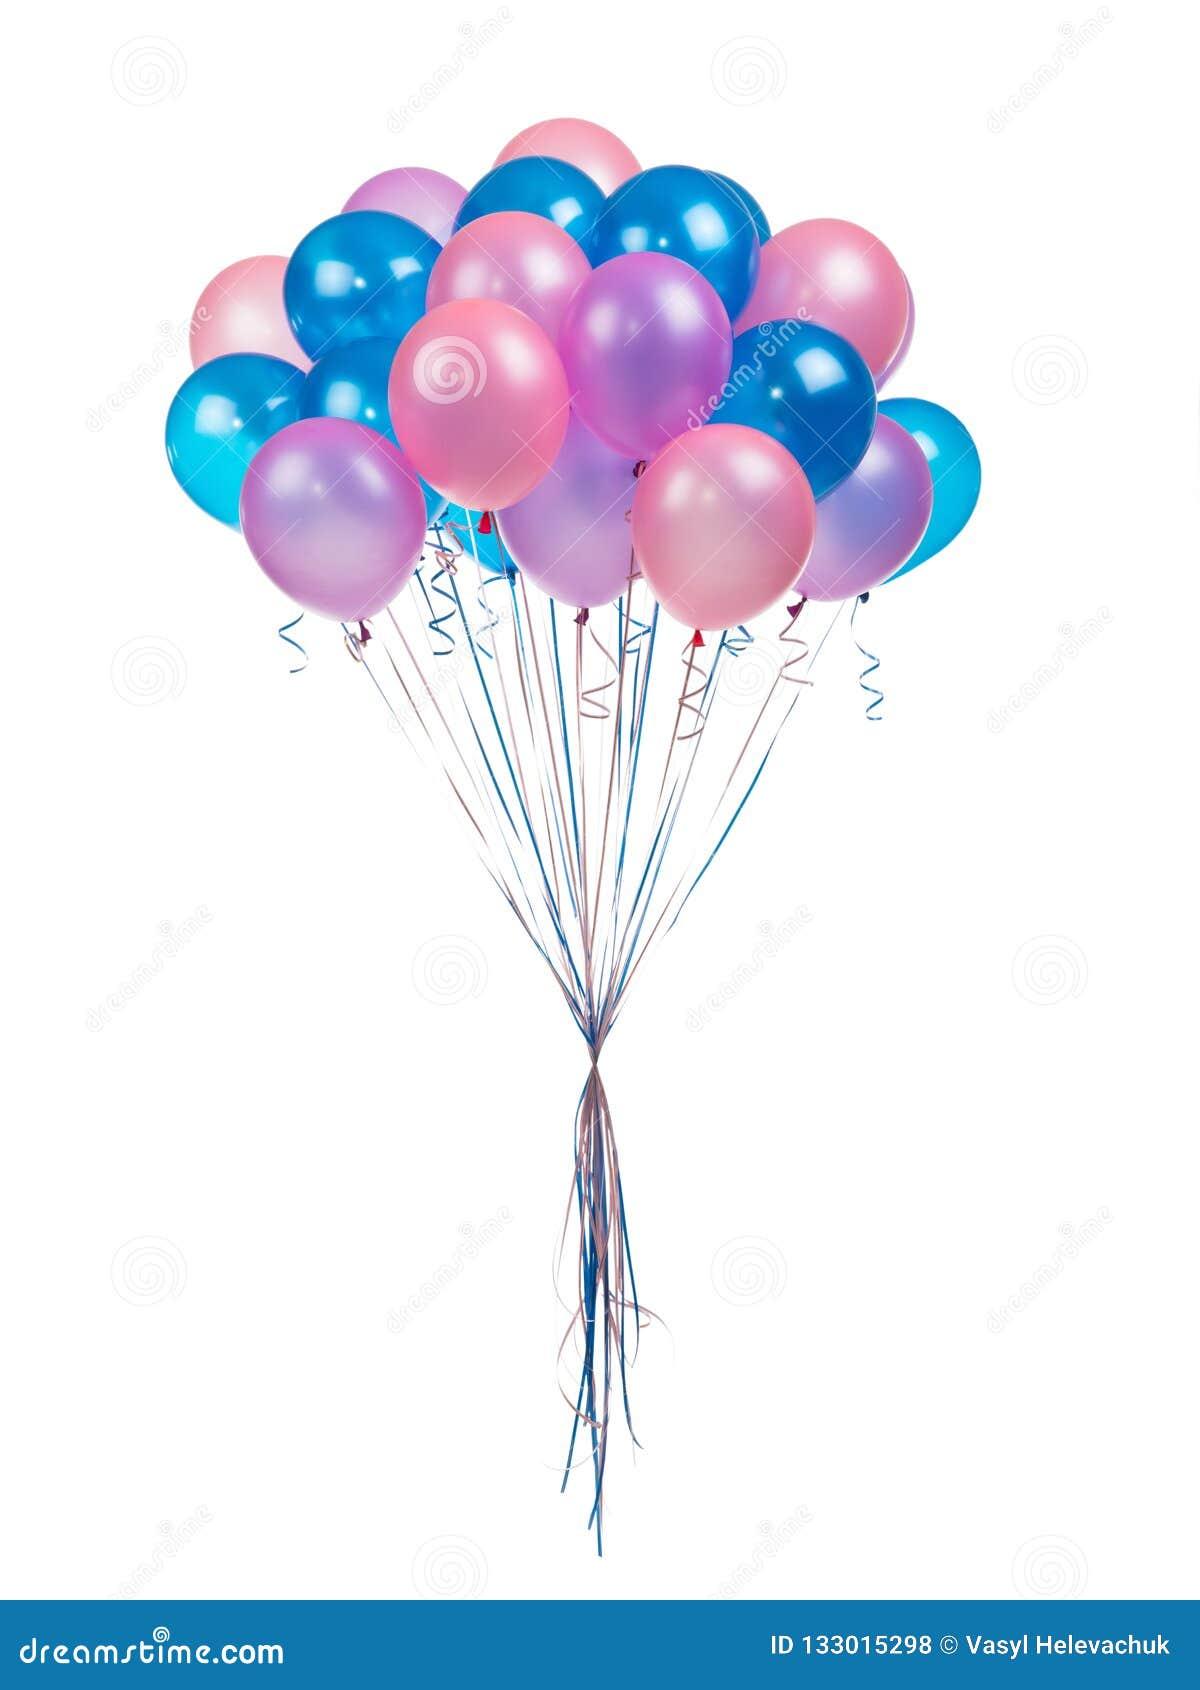 Balon koloru dni wakacji wektora